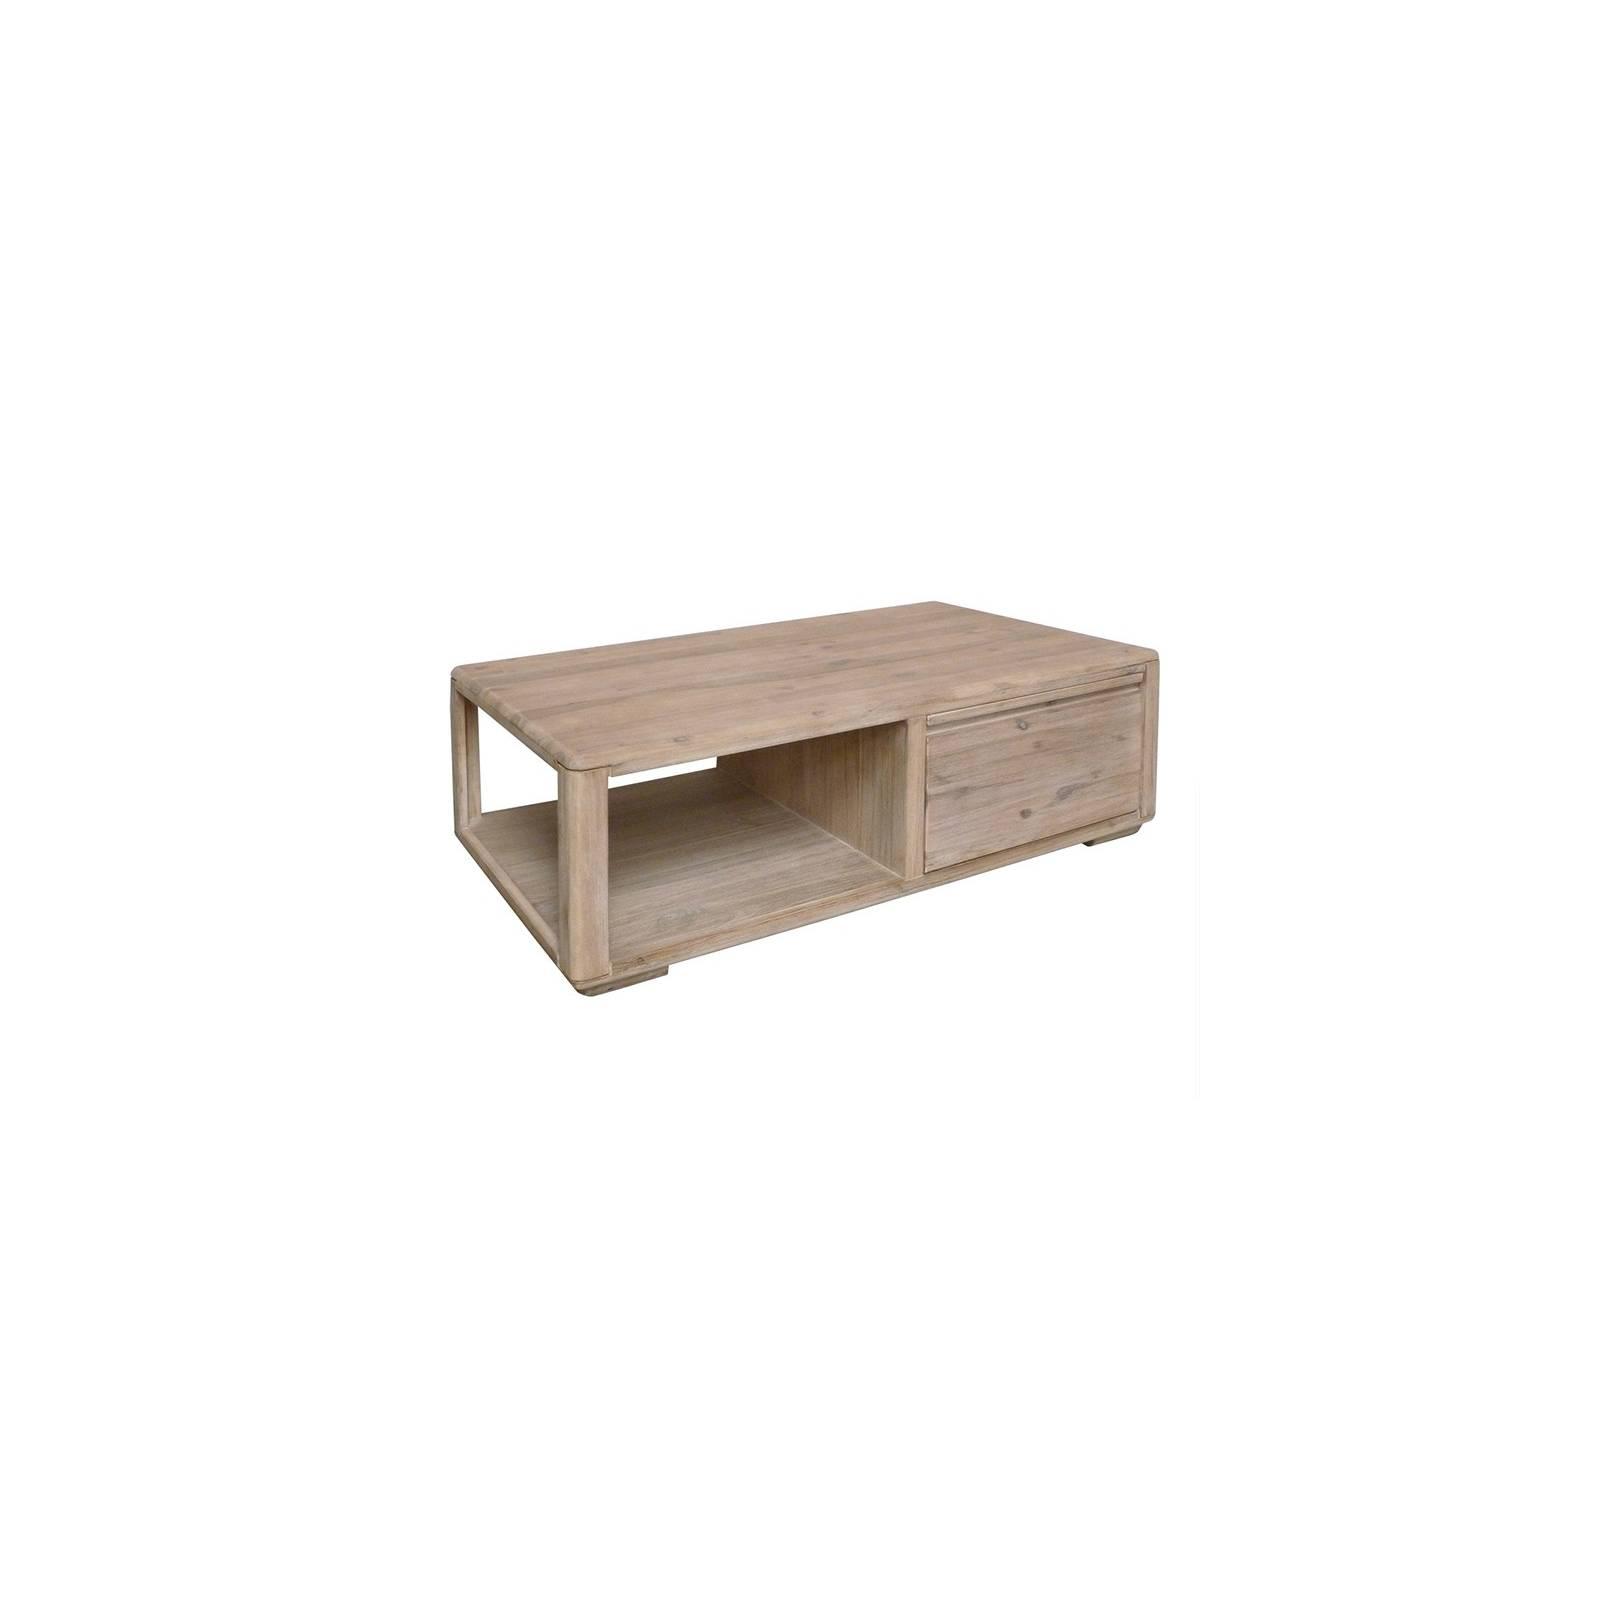 Table Basse Rectangulaire Joëlle Acacia - meuble en bois massif